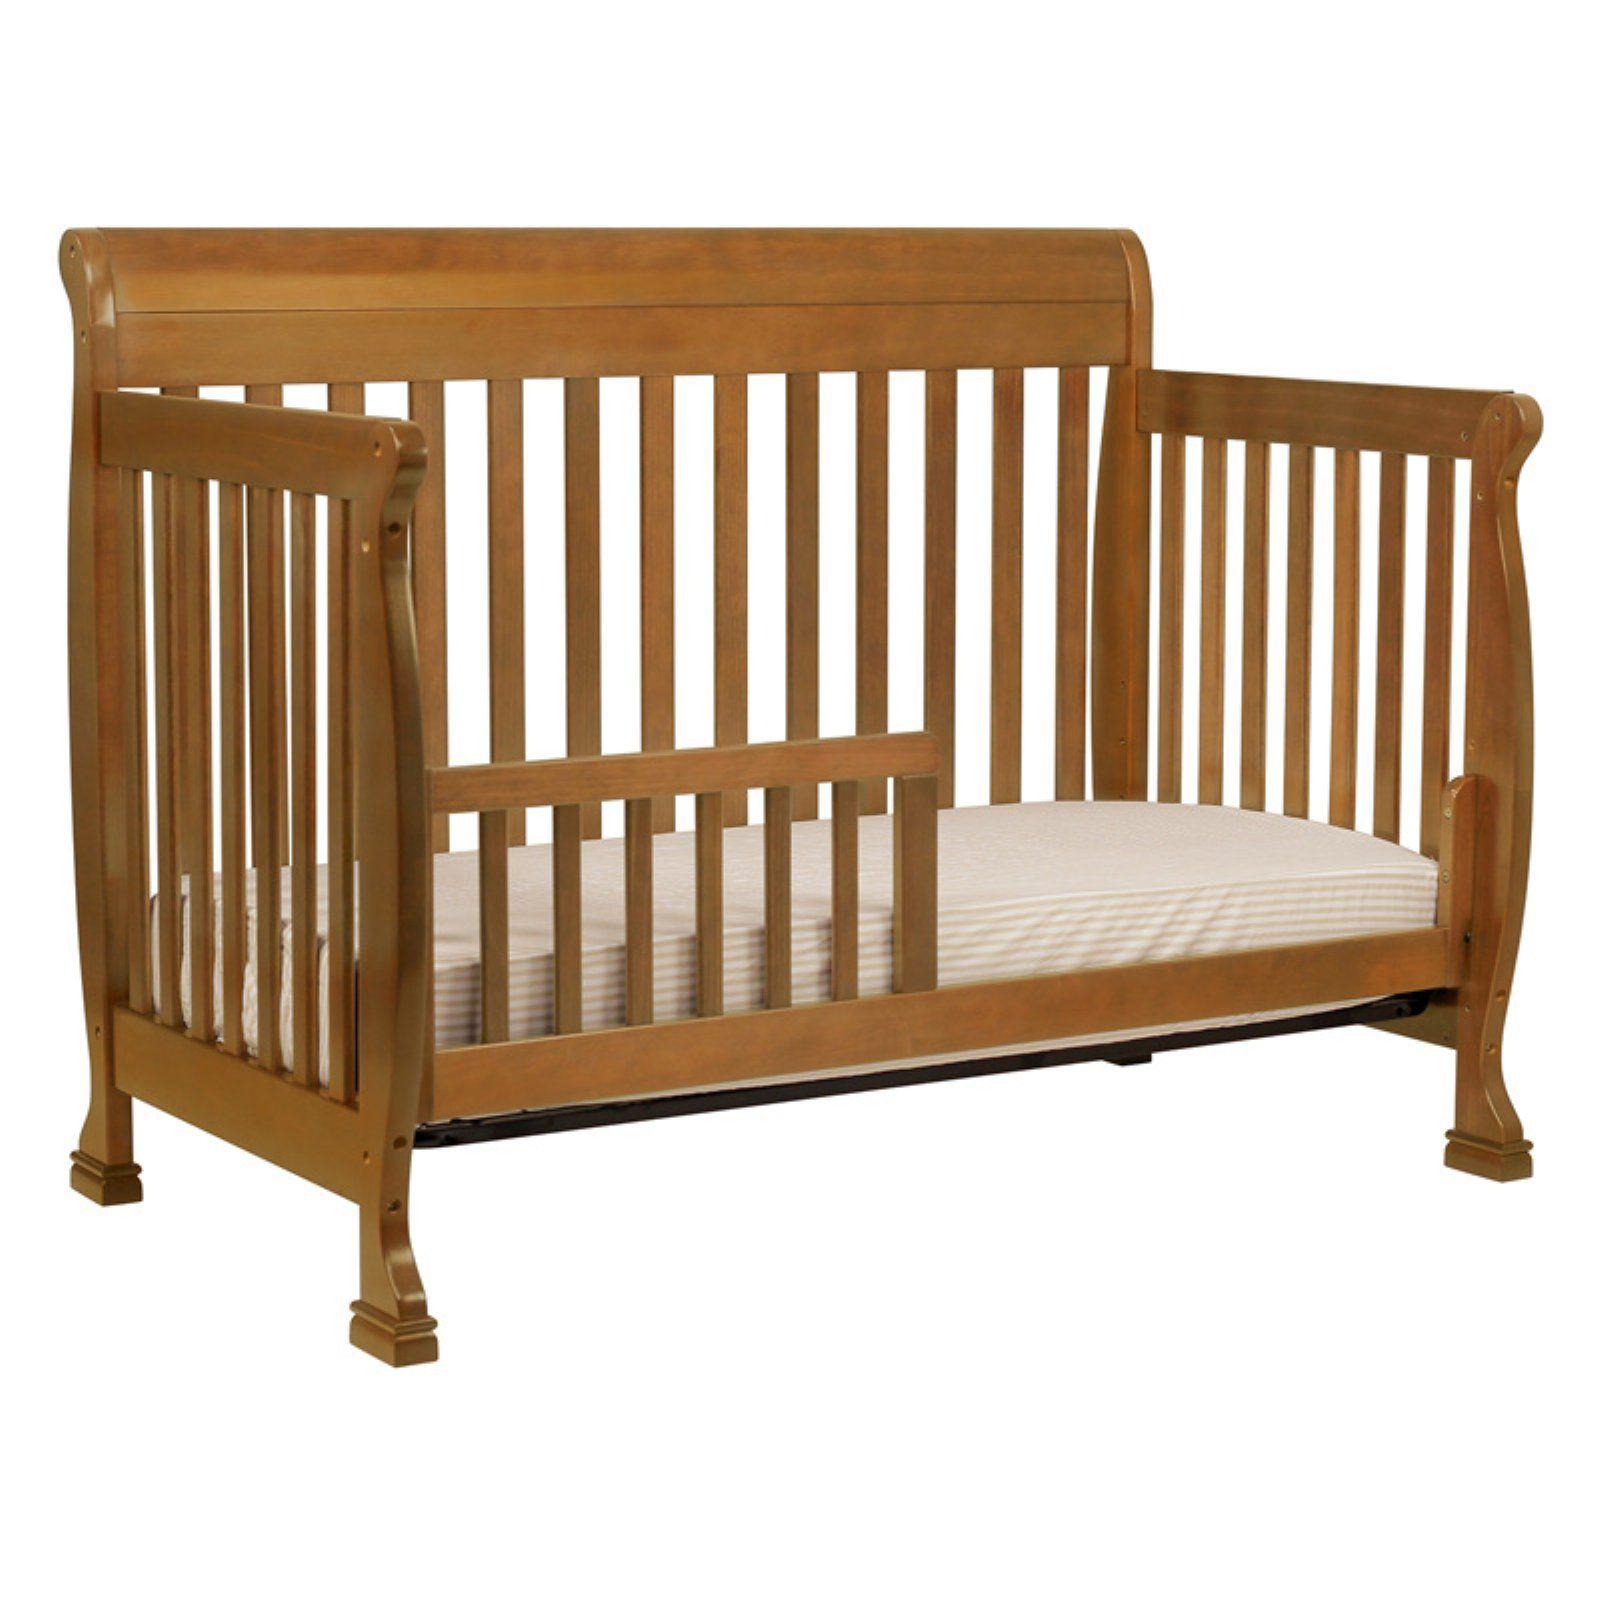 Davinci Kalani 4 In 1 Convertible Crib Grey Convertible Crib